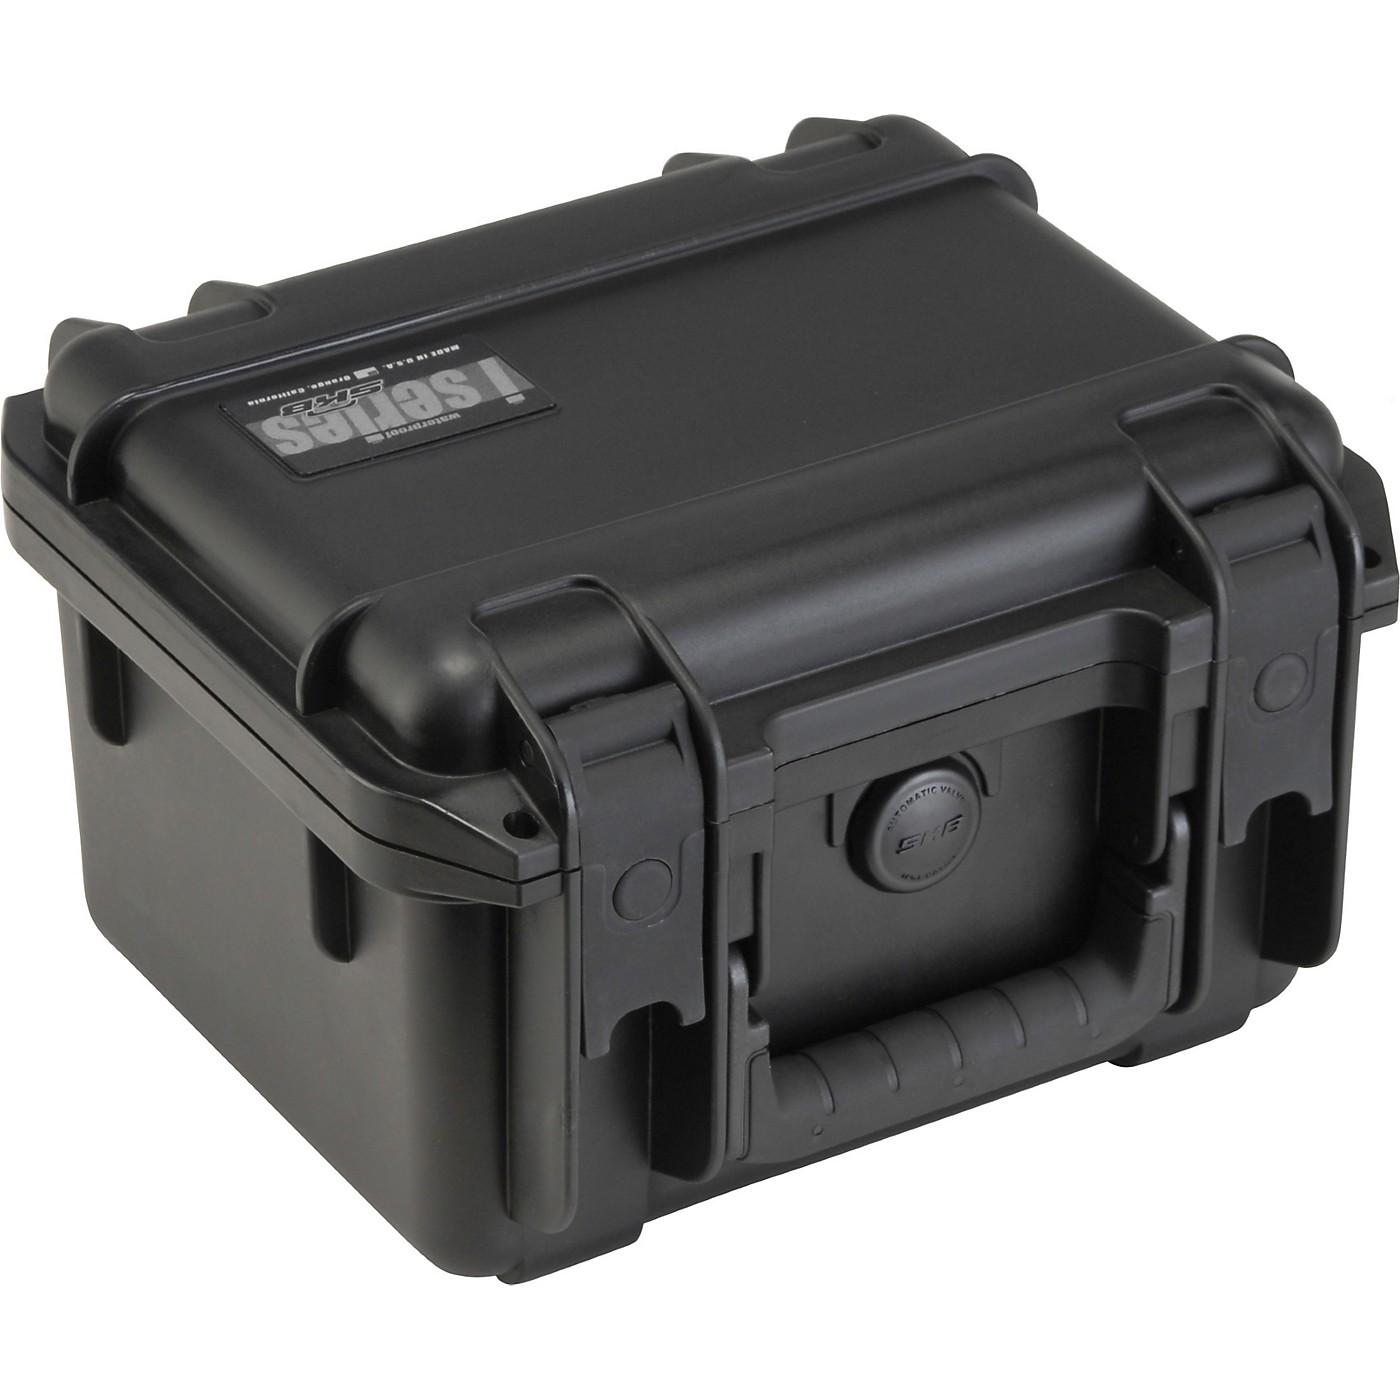 SKB 3i-0907-6B Military Standard Waterproof Case thumbnail